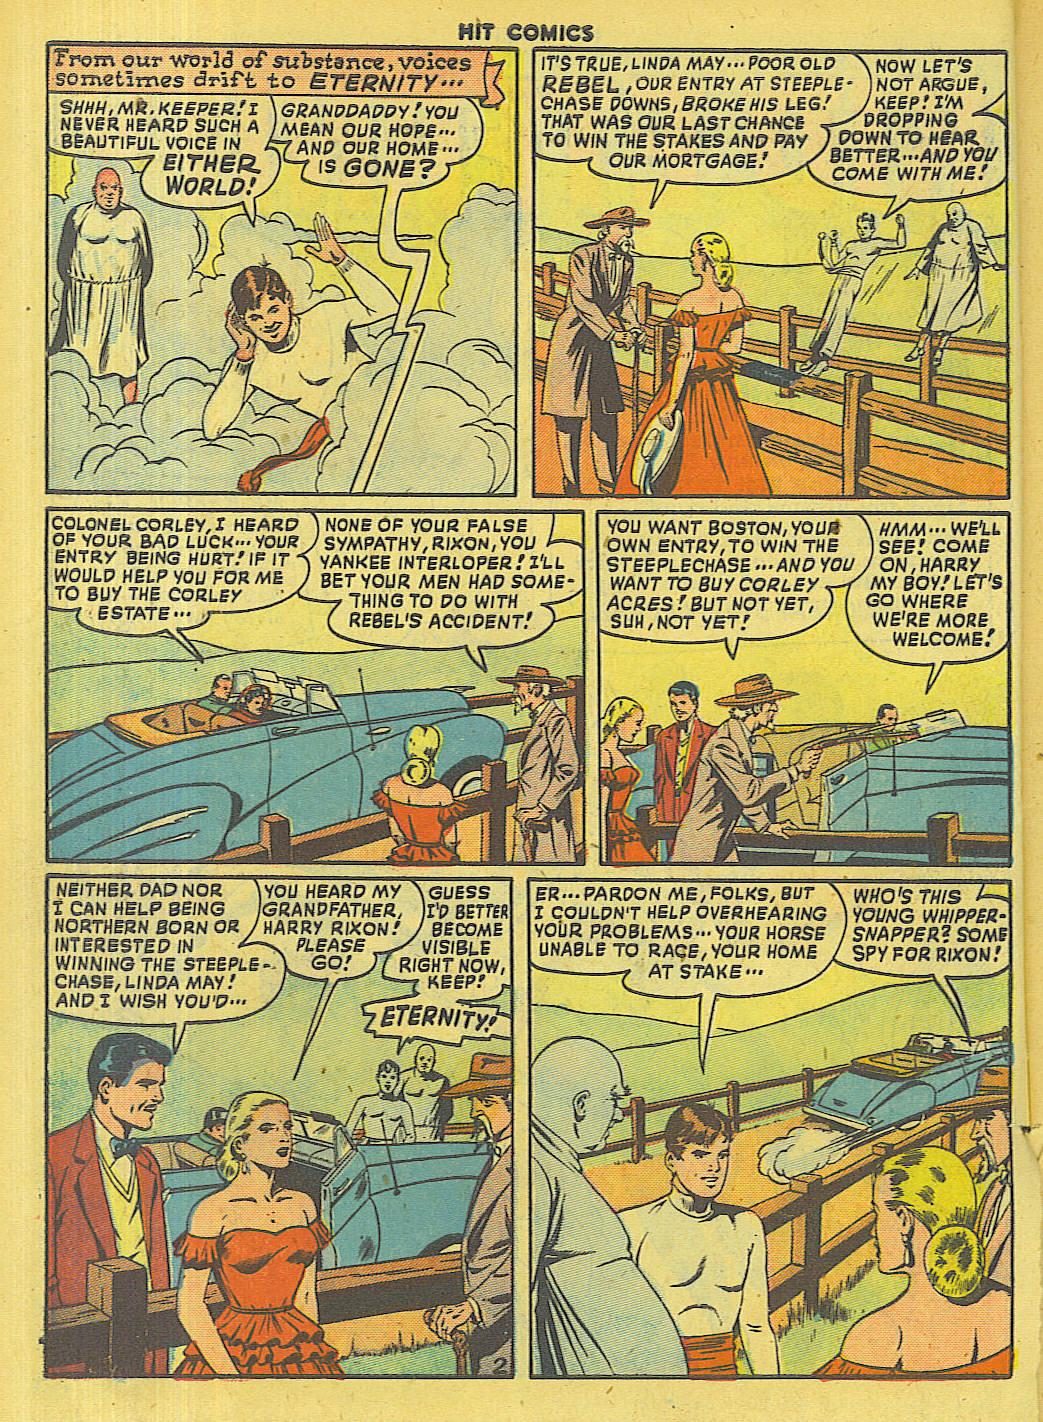 Read online Hit Comics comic -  Issue #56 - 4